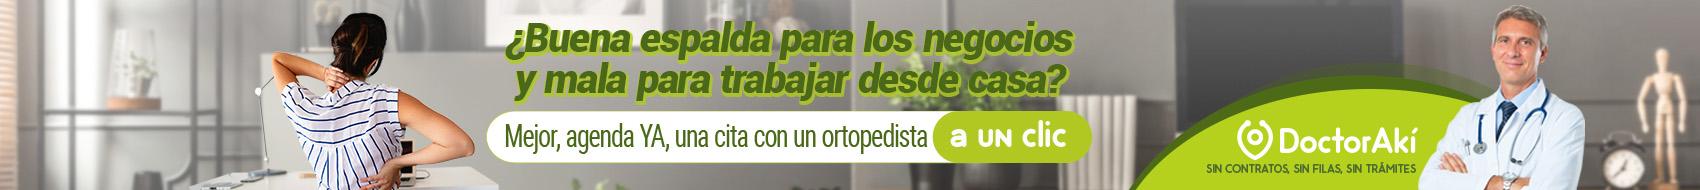 Postpandemia Ortopedista 1700X190